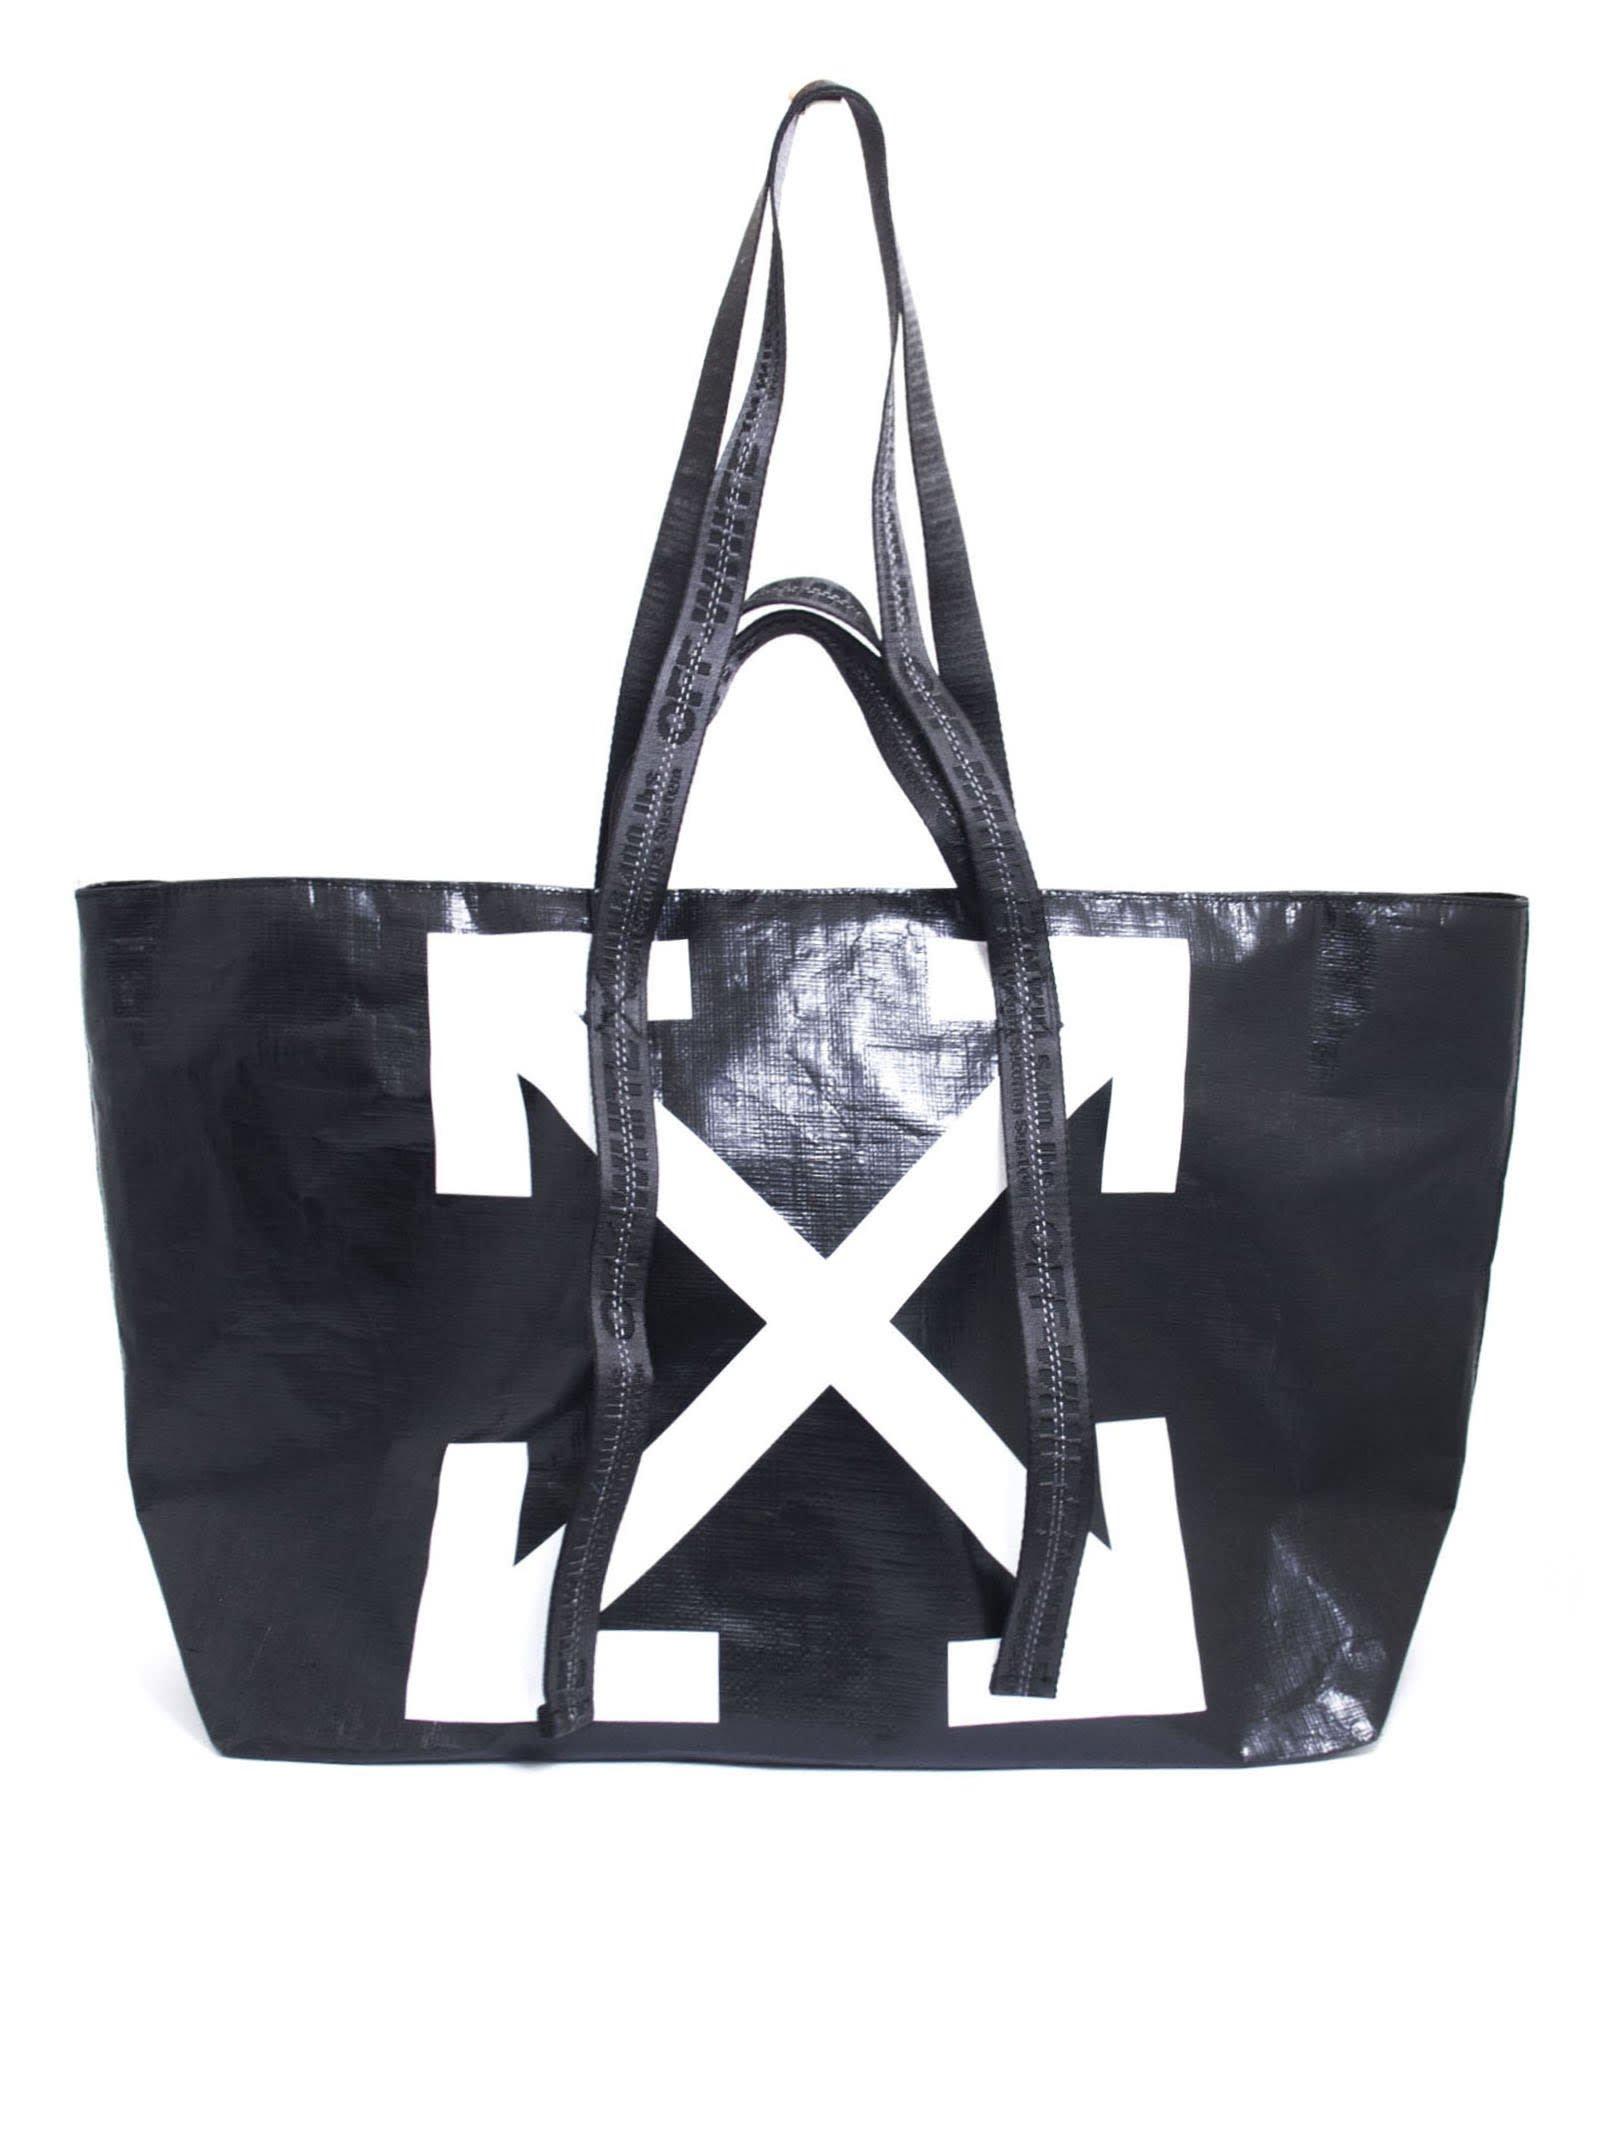 Off-White Black Tote Bag